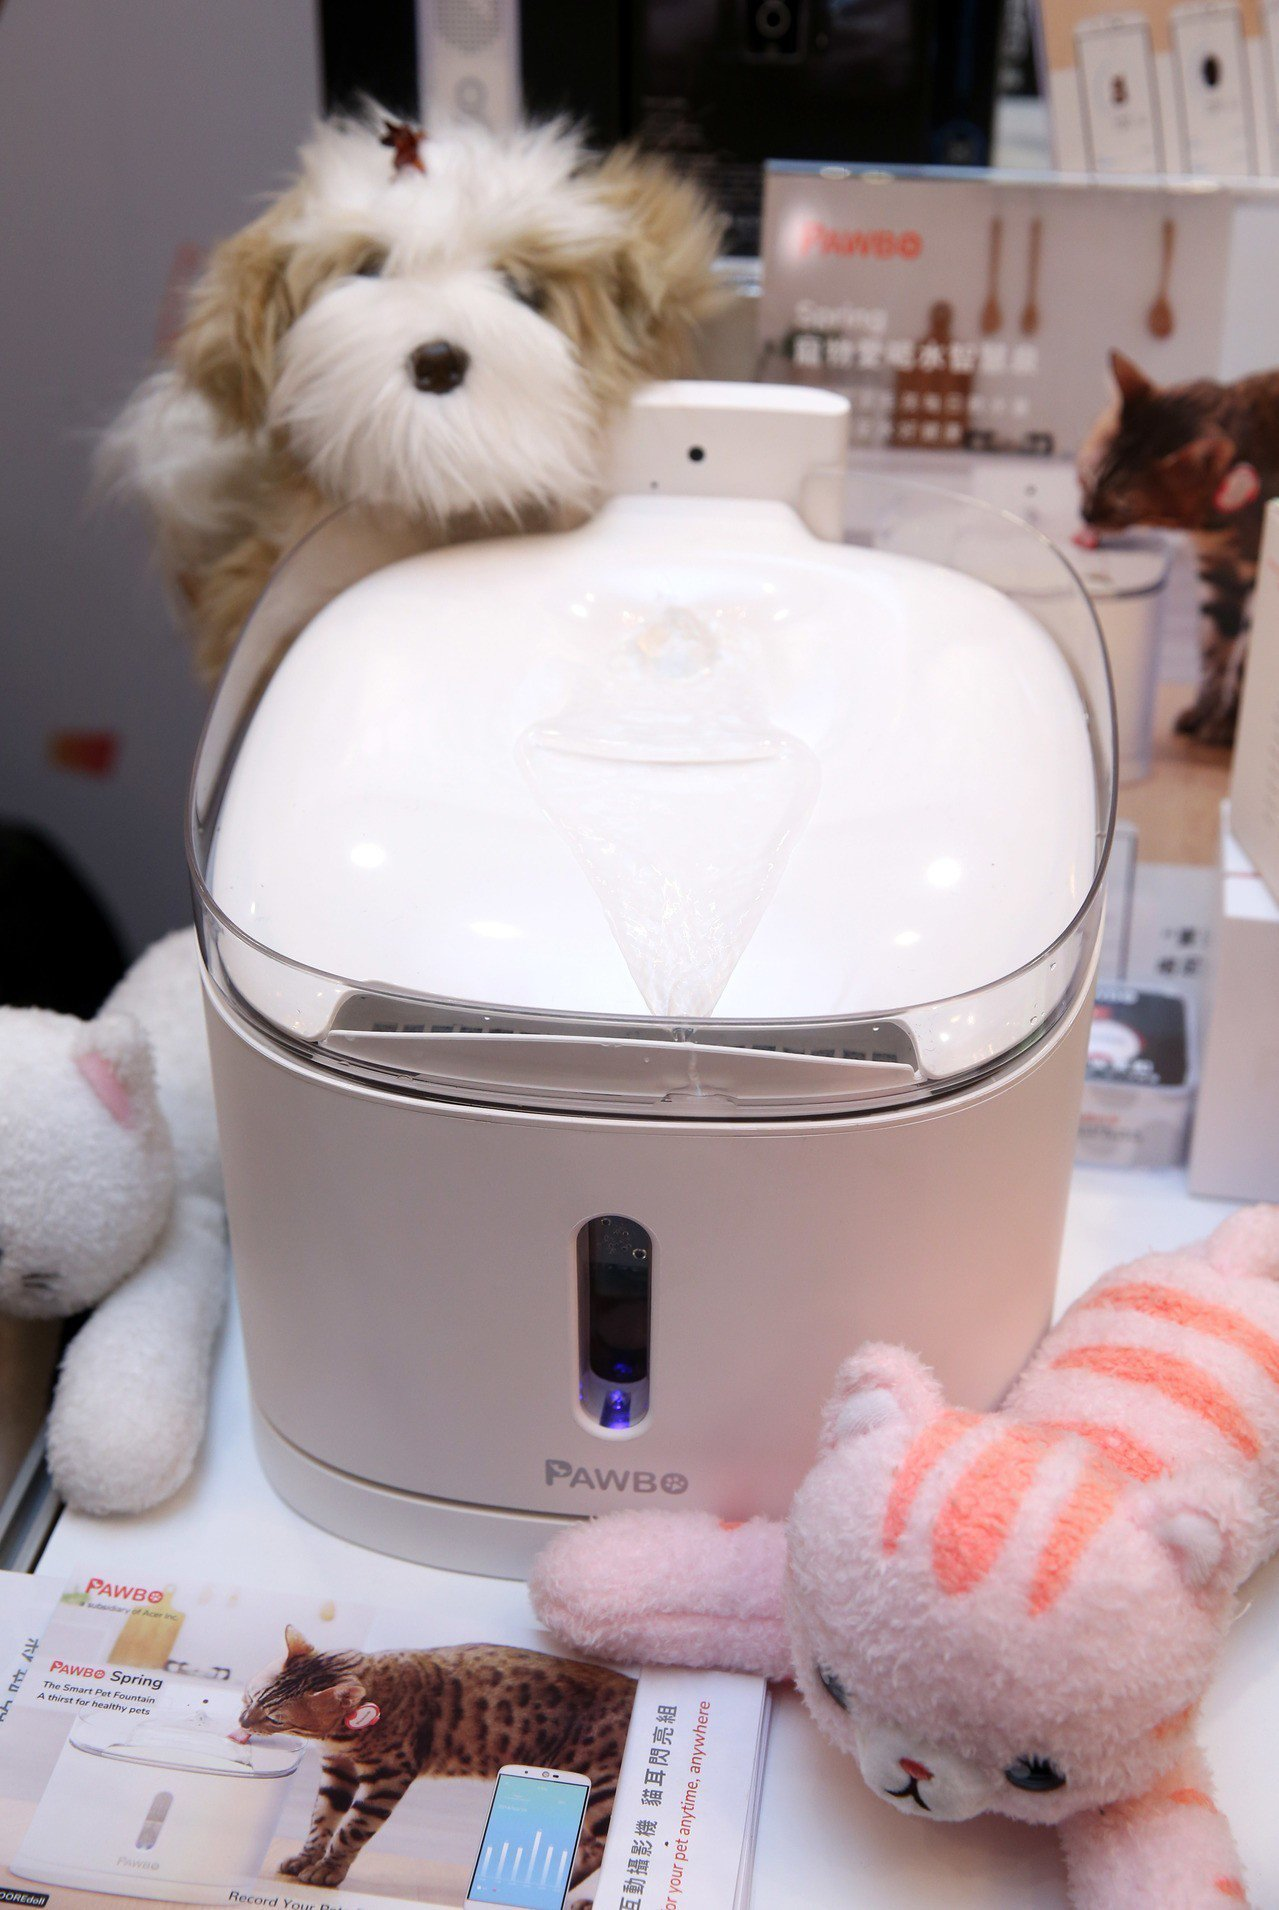 PAWBO Spring寵物愛喝水智慧泉,預購價5,980元。記者邱德祥/攝影